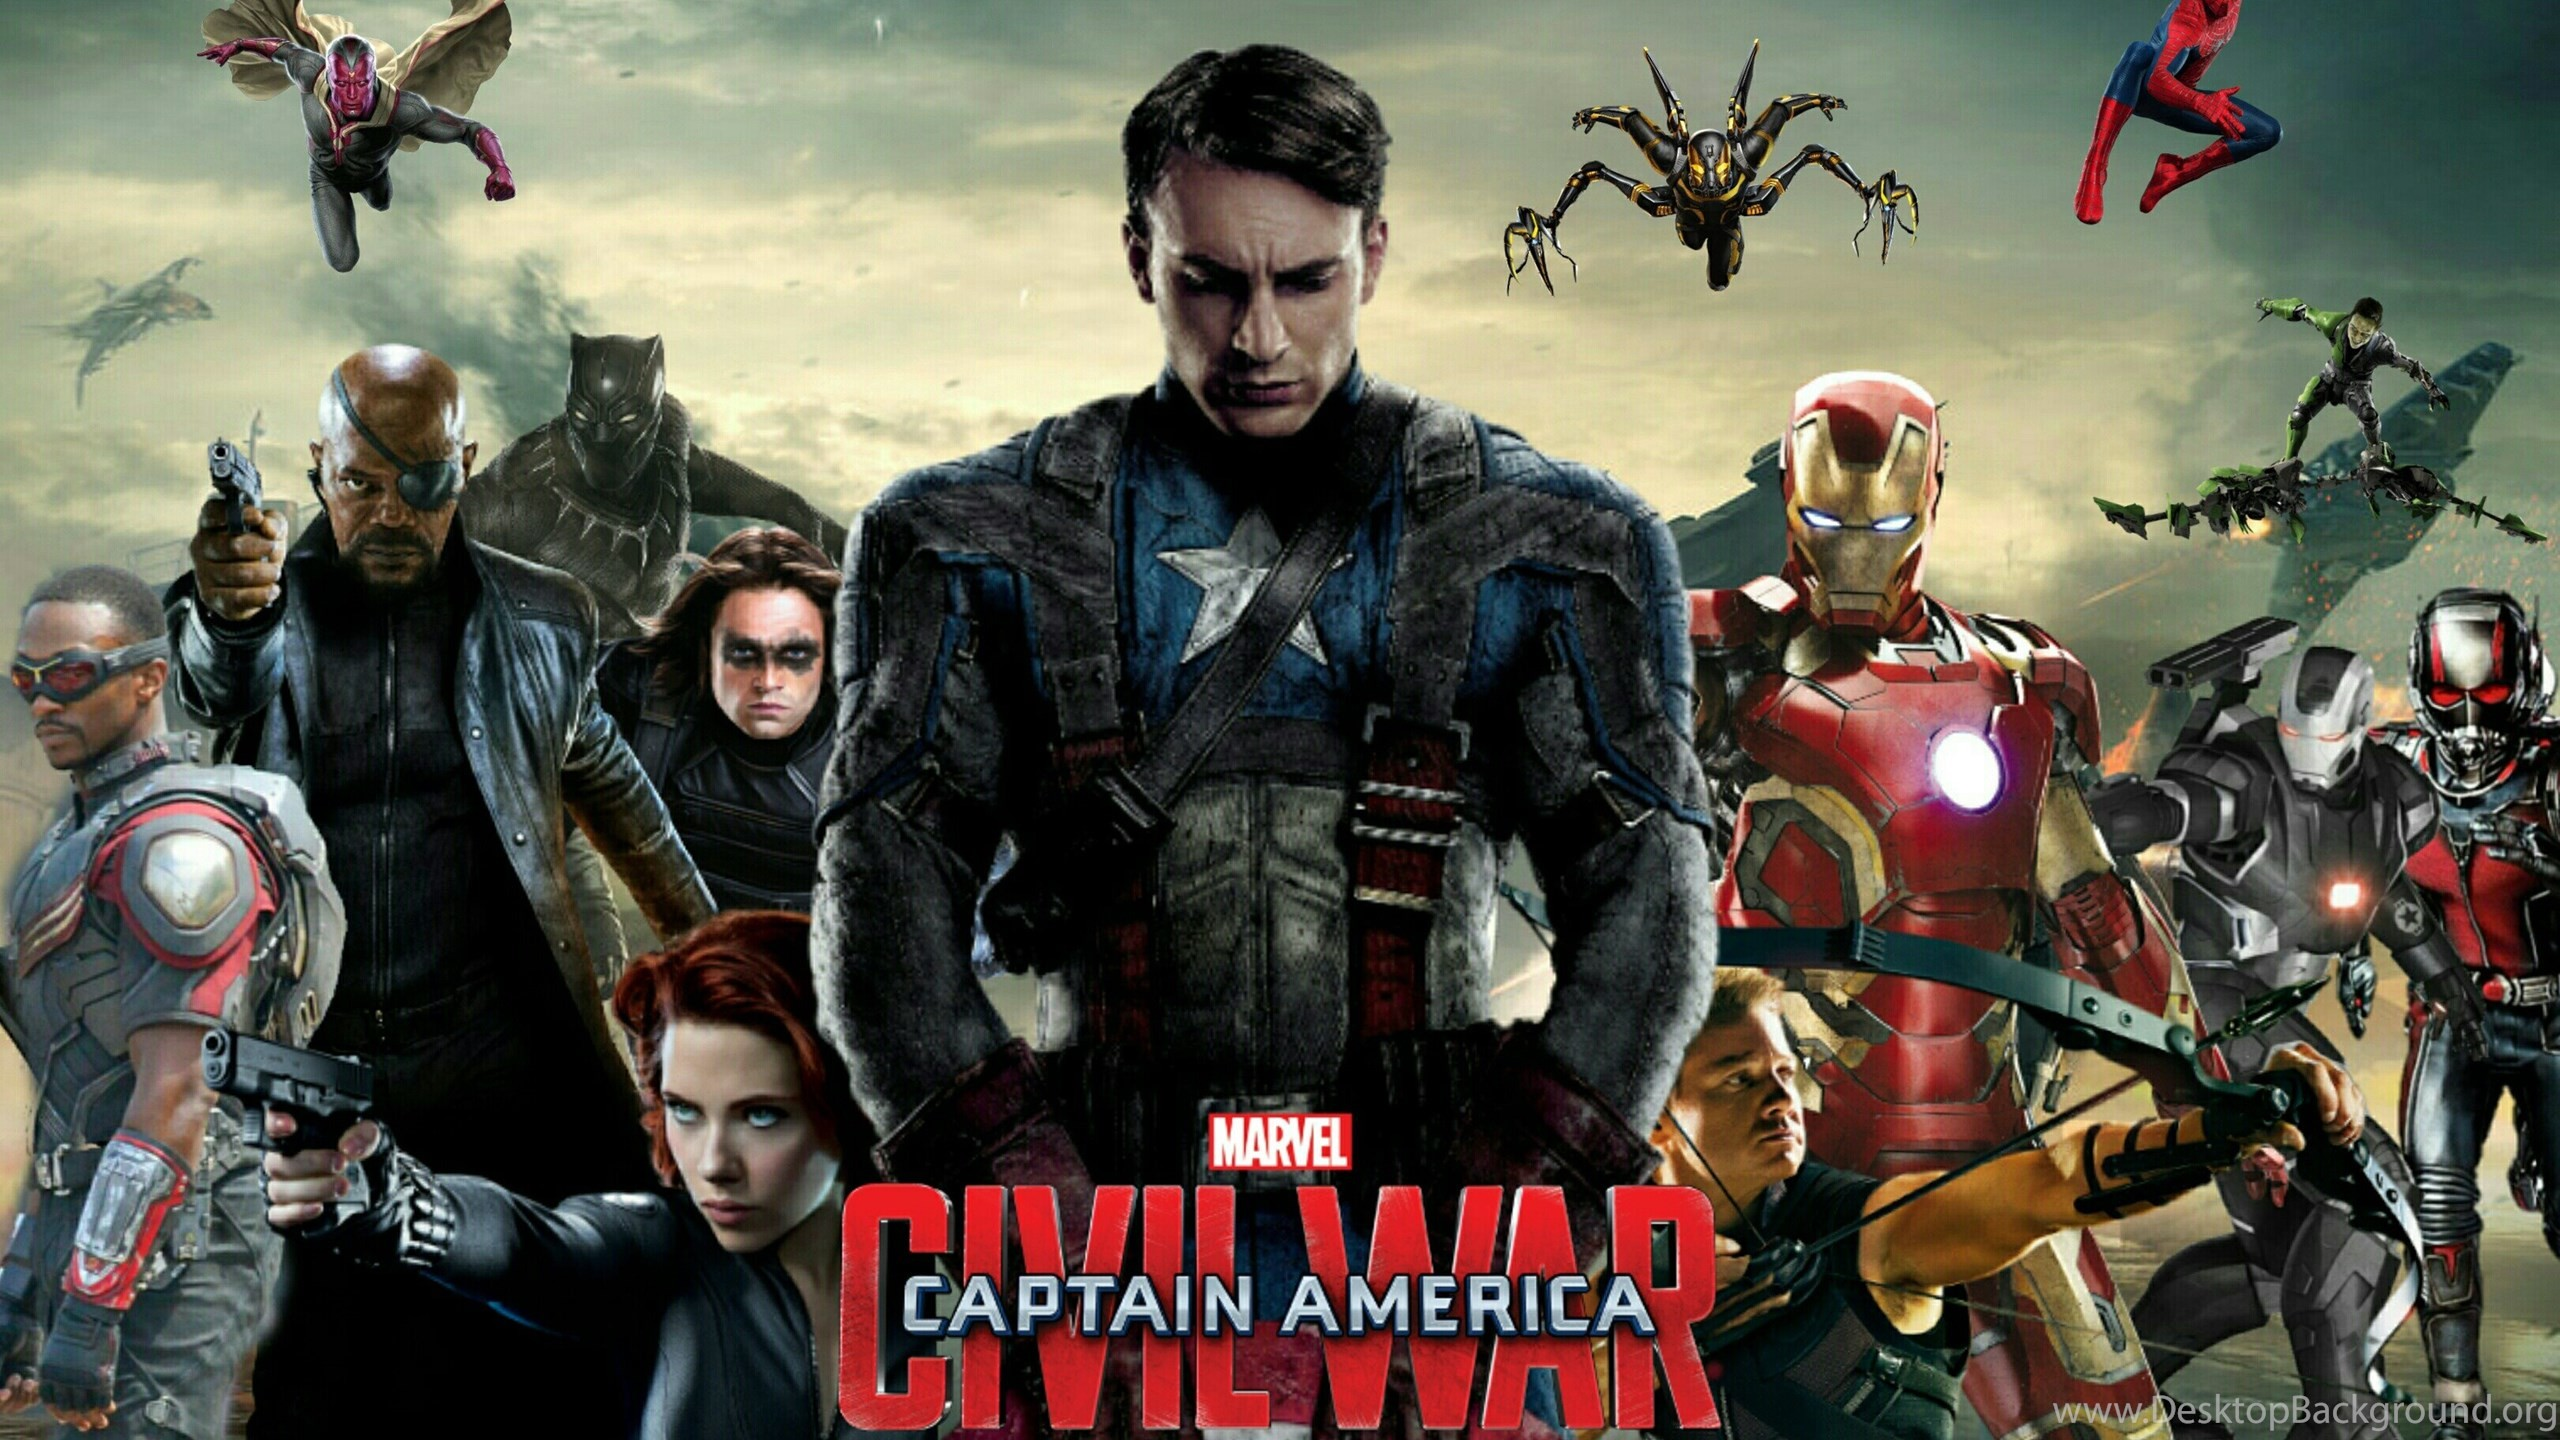 Civil War Marvel HD Wallpaper (70+ images)  Civil War Marve...